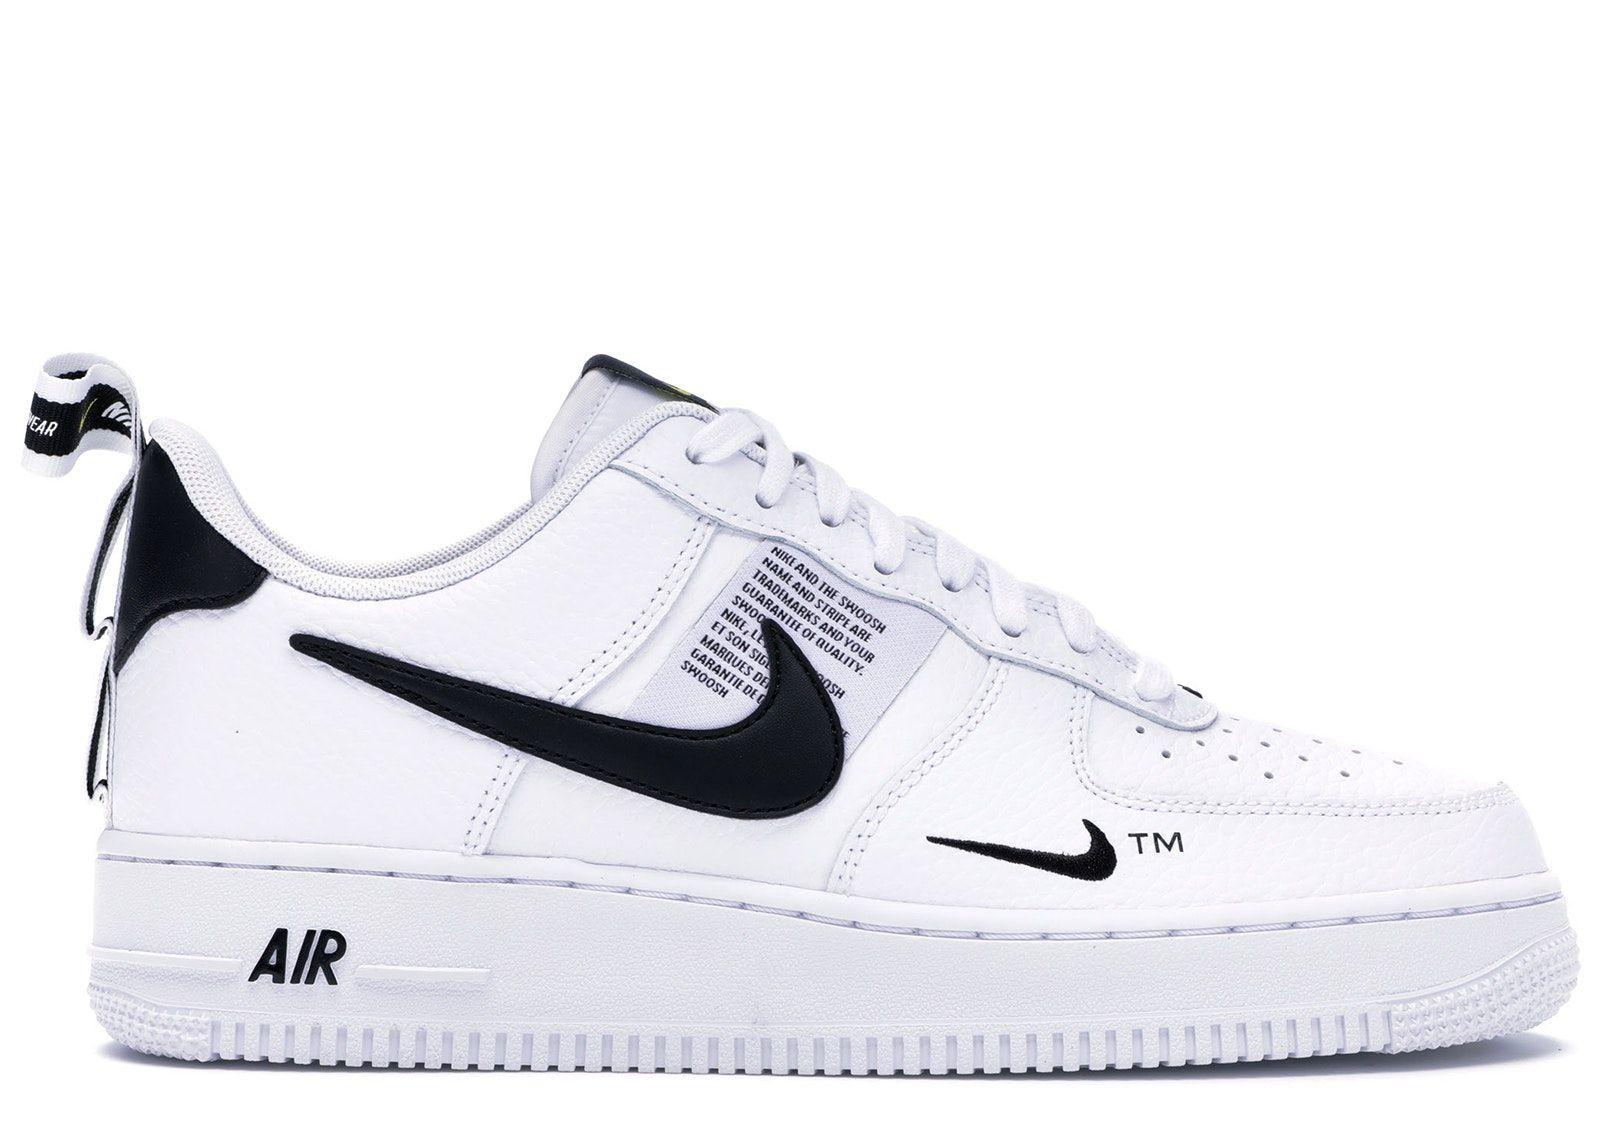 Nike Air Force 1 Low Utility White Black In 2020 Nike Air Shoes Black Nikes White Sneakers Women